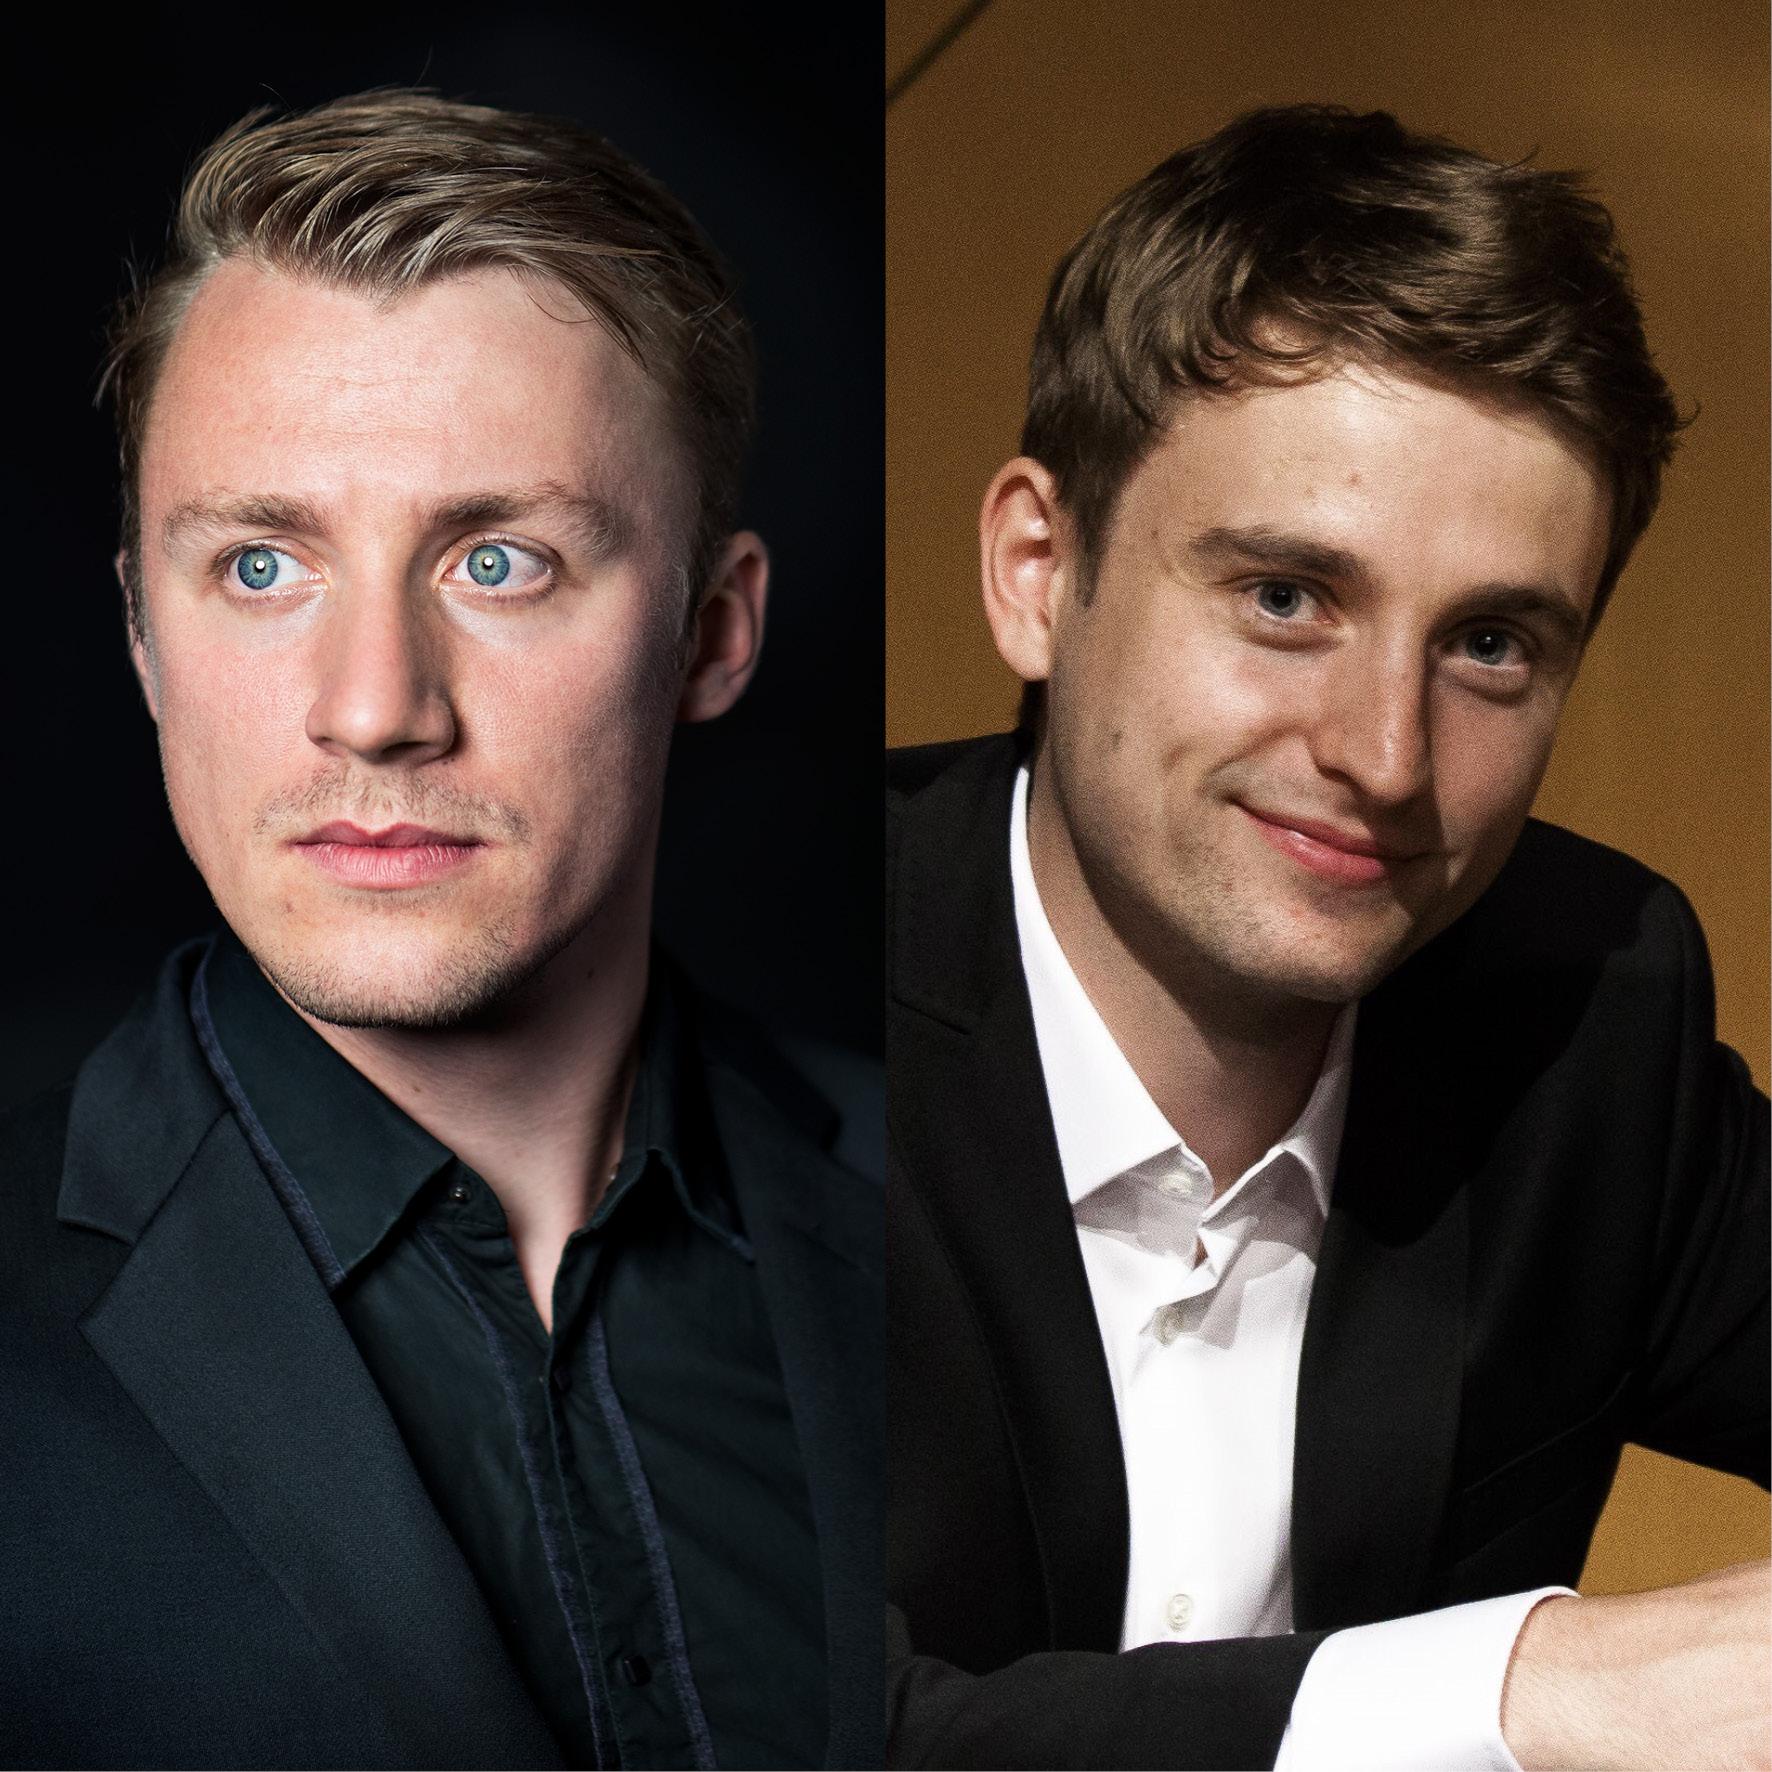 Duo 27: Johannes Schwarz / Lukas Rommelspacher